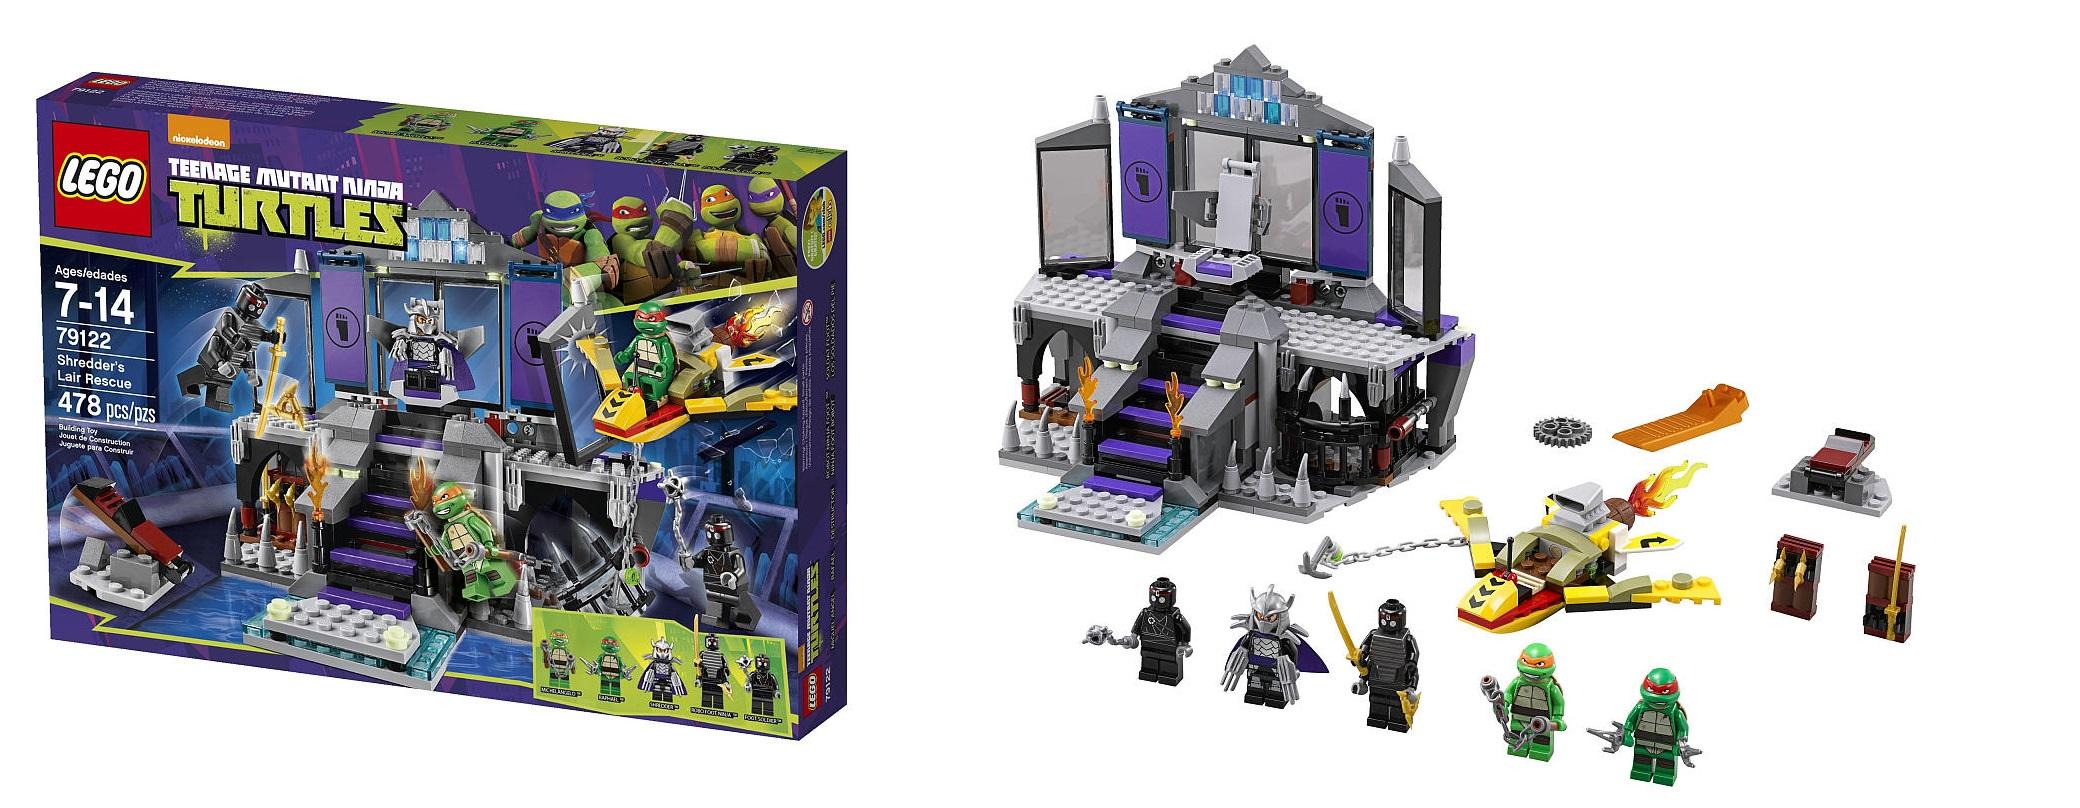 79122 Shredder S Lair Rescue Lego Tmnt Set Toys N Bricks Lego